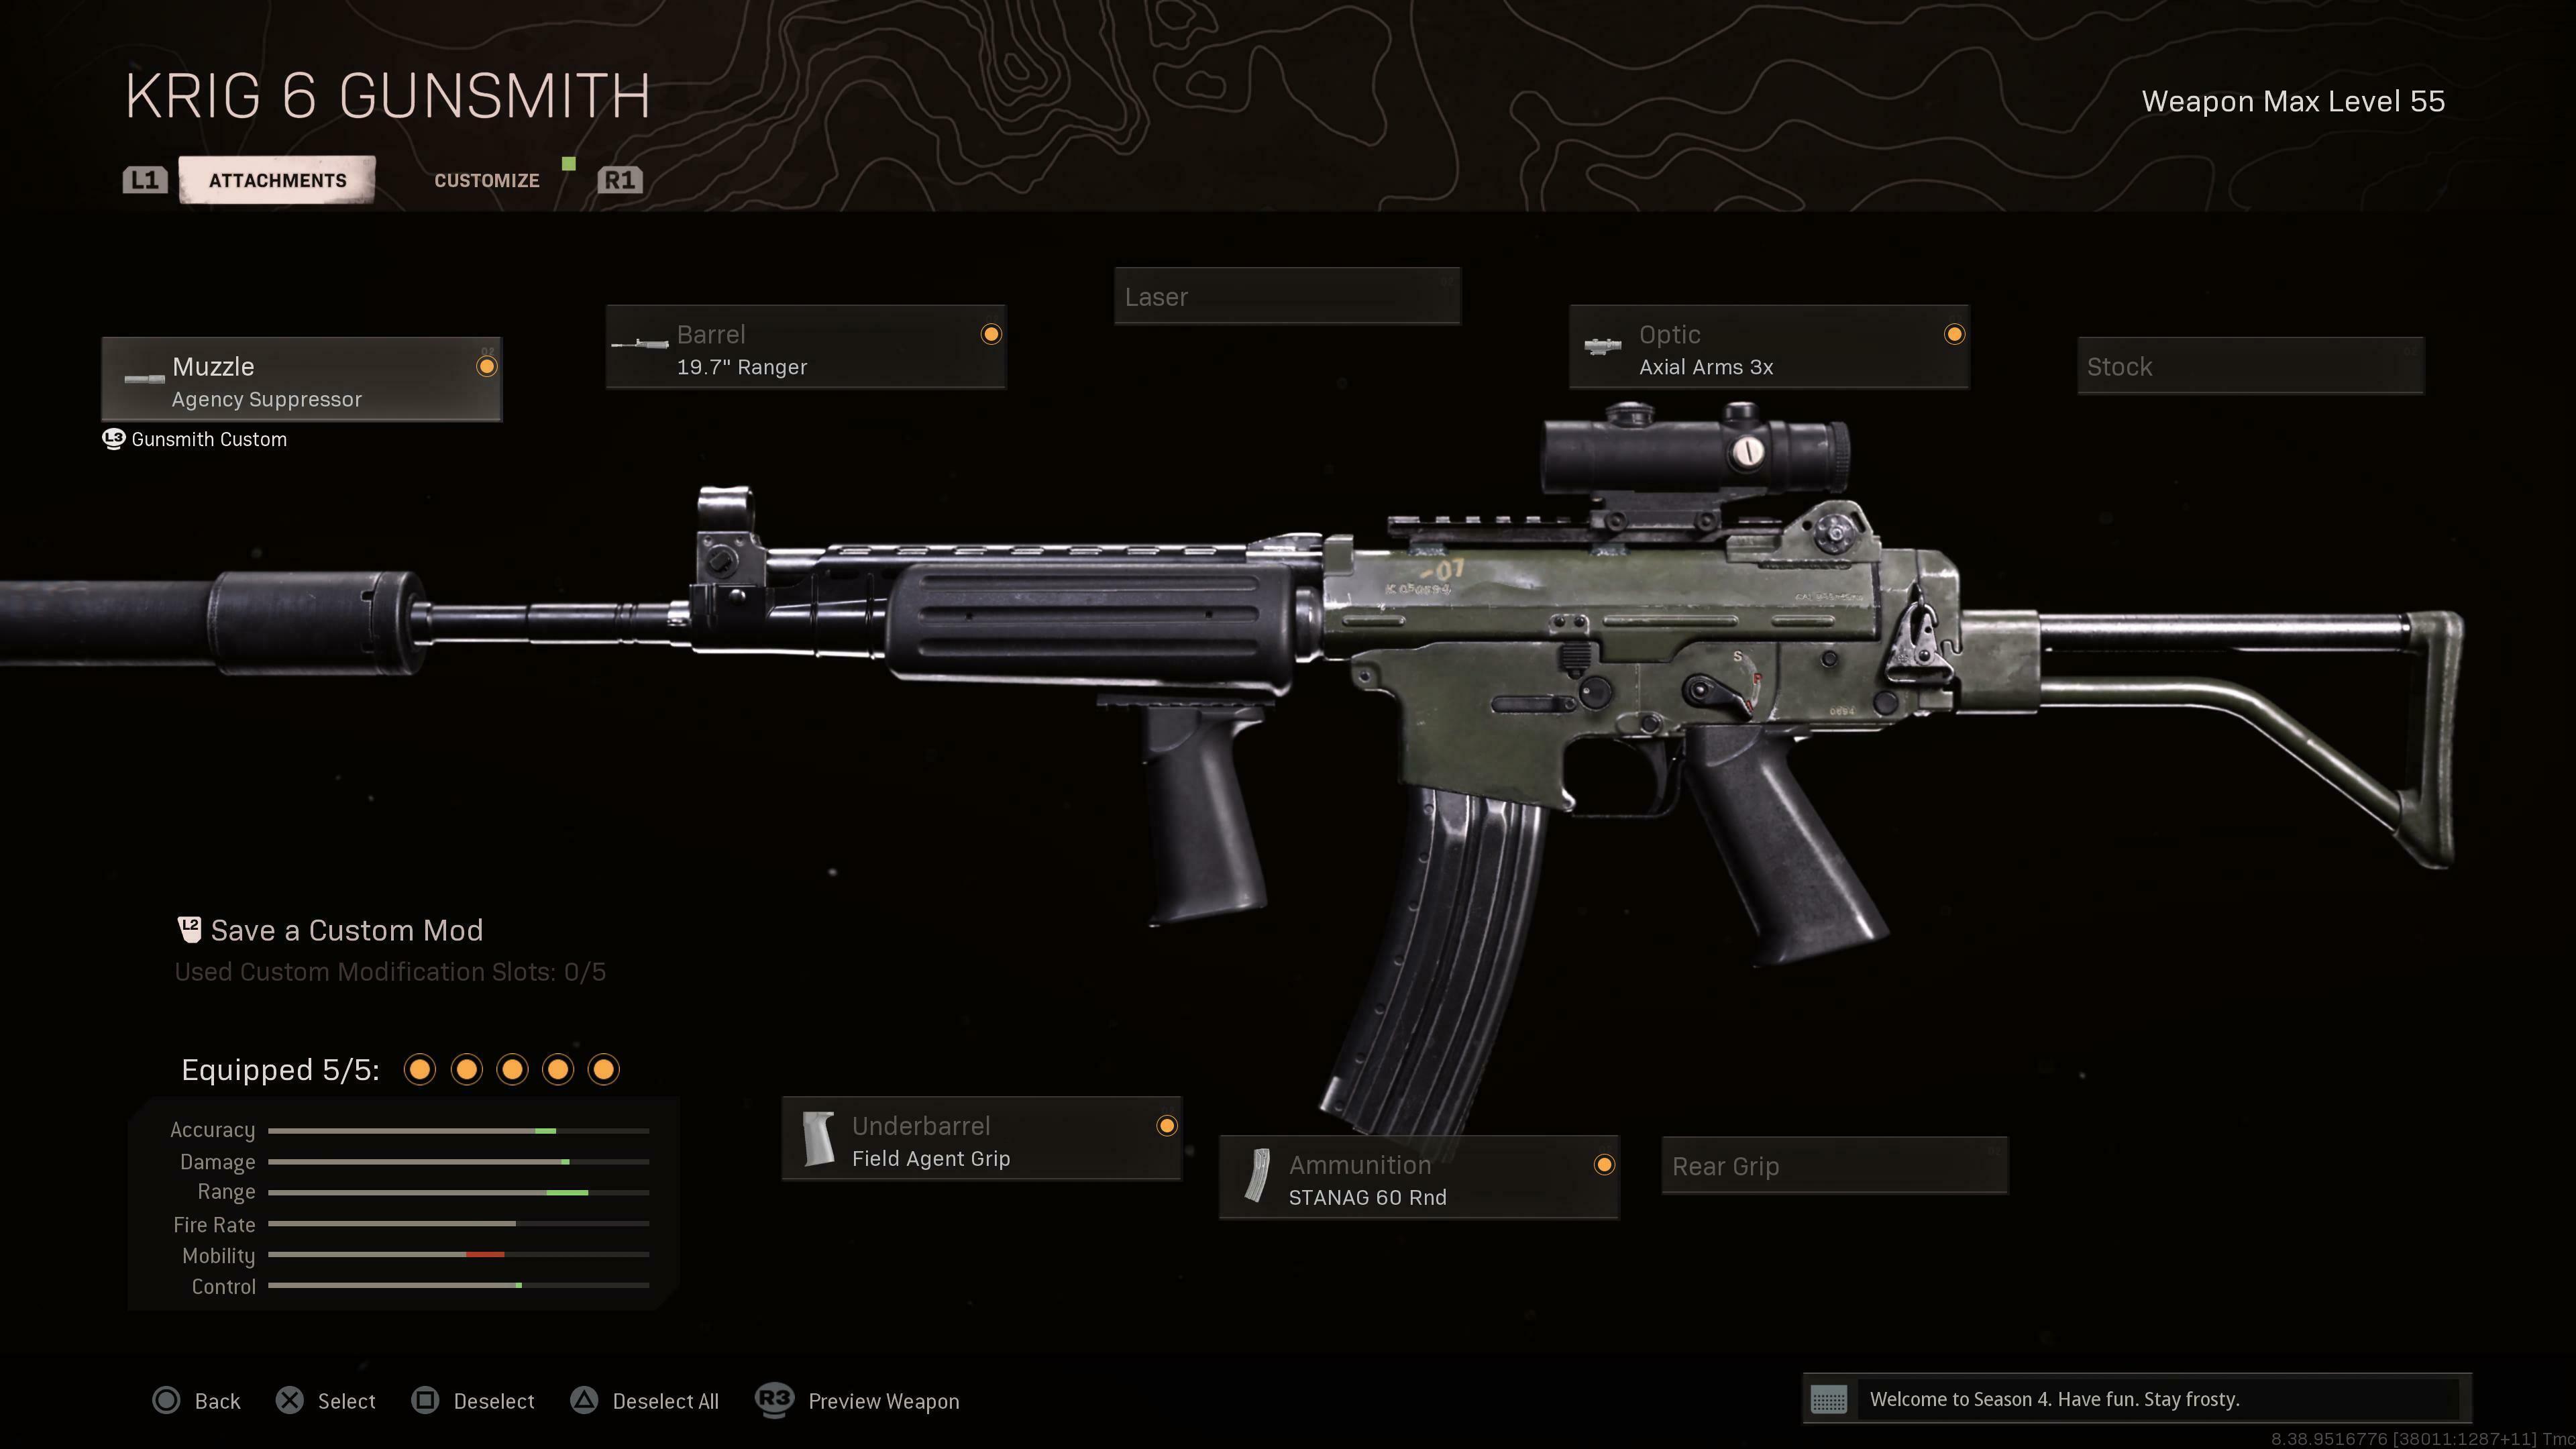 Best Warzone Loadout | Call of Duty: Warzone Season 4 - GameSpot